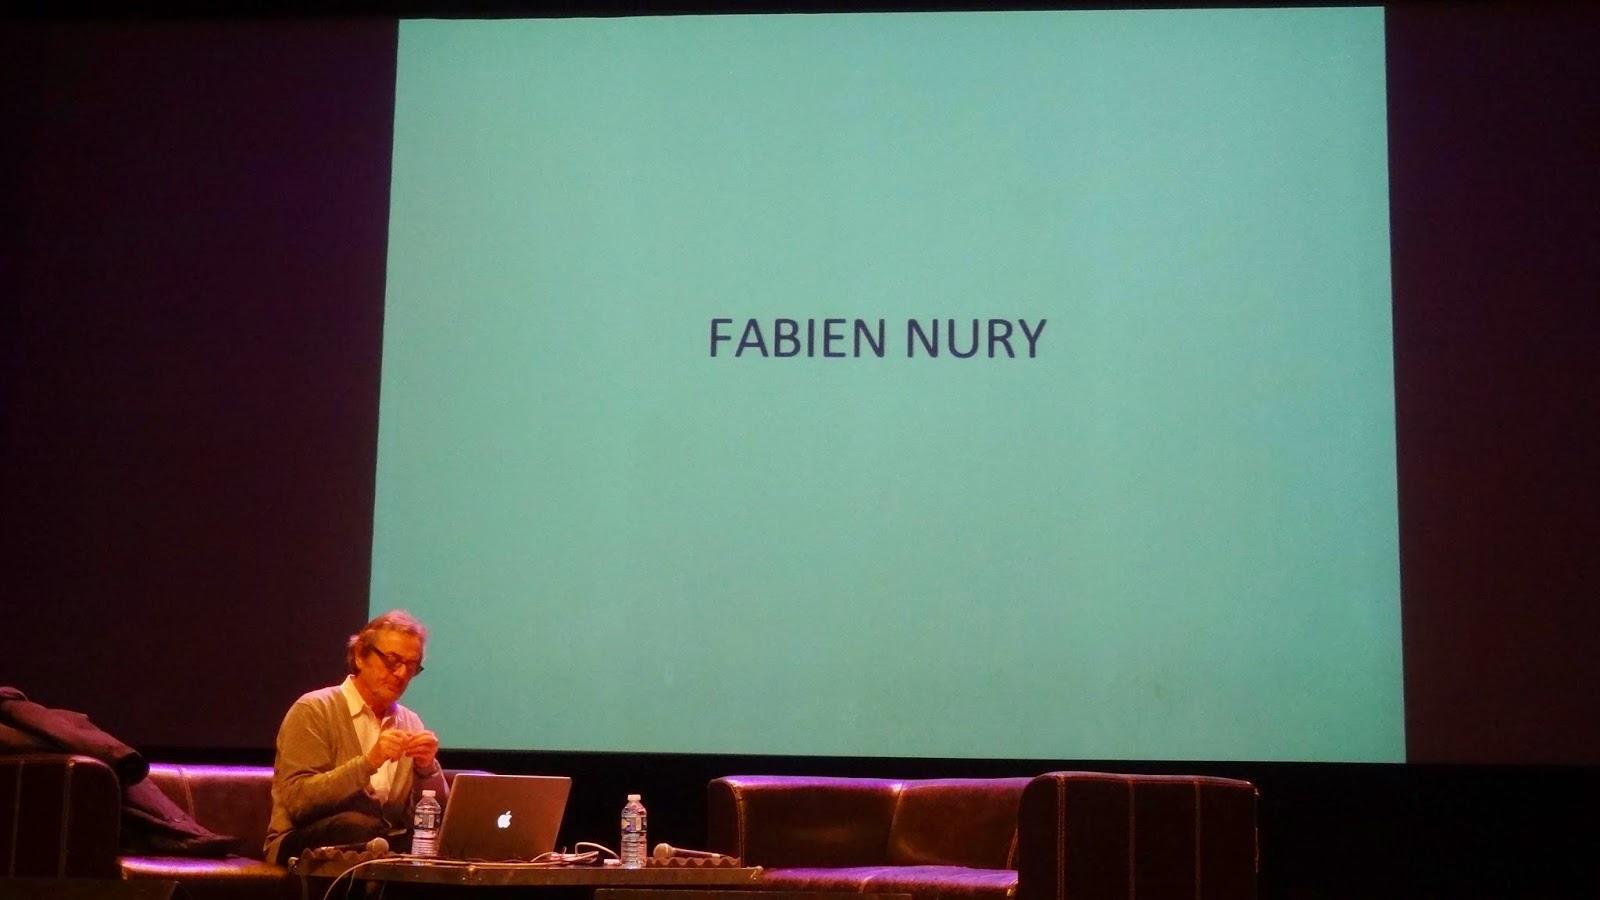 Conférence Nury, FIBD Angoulême 2015, installation